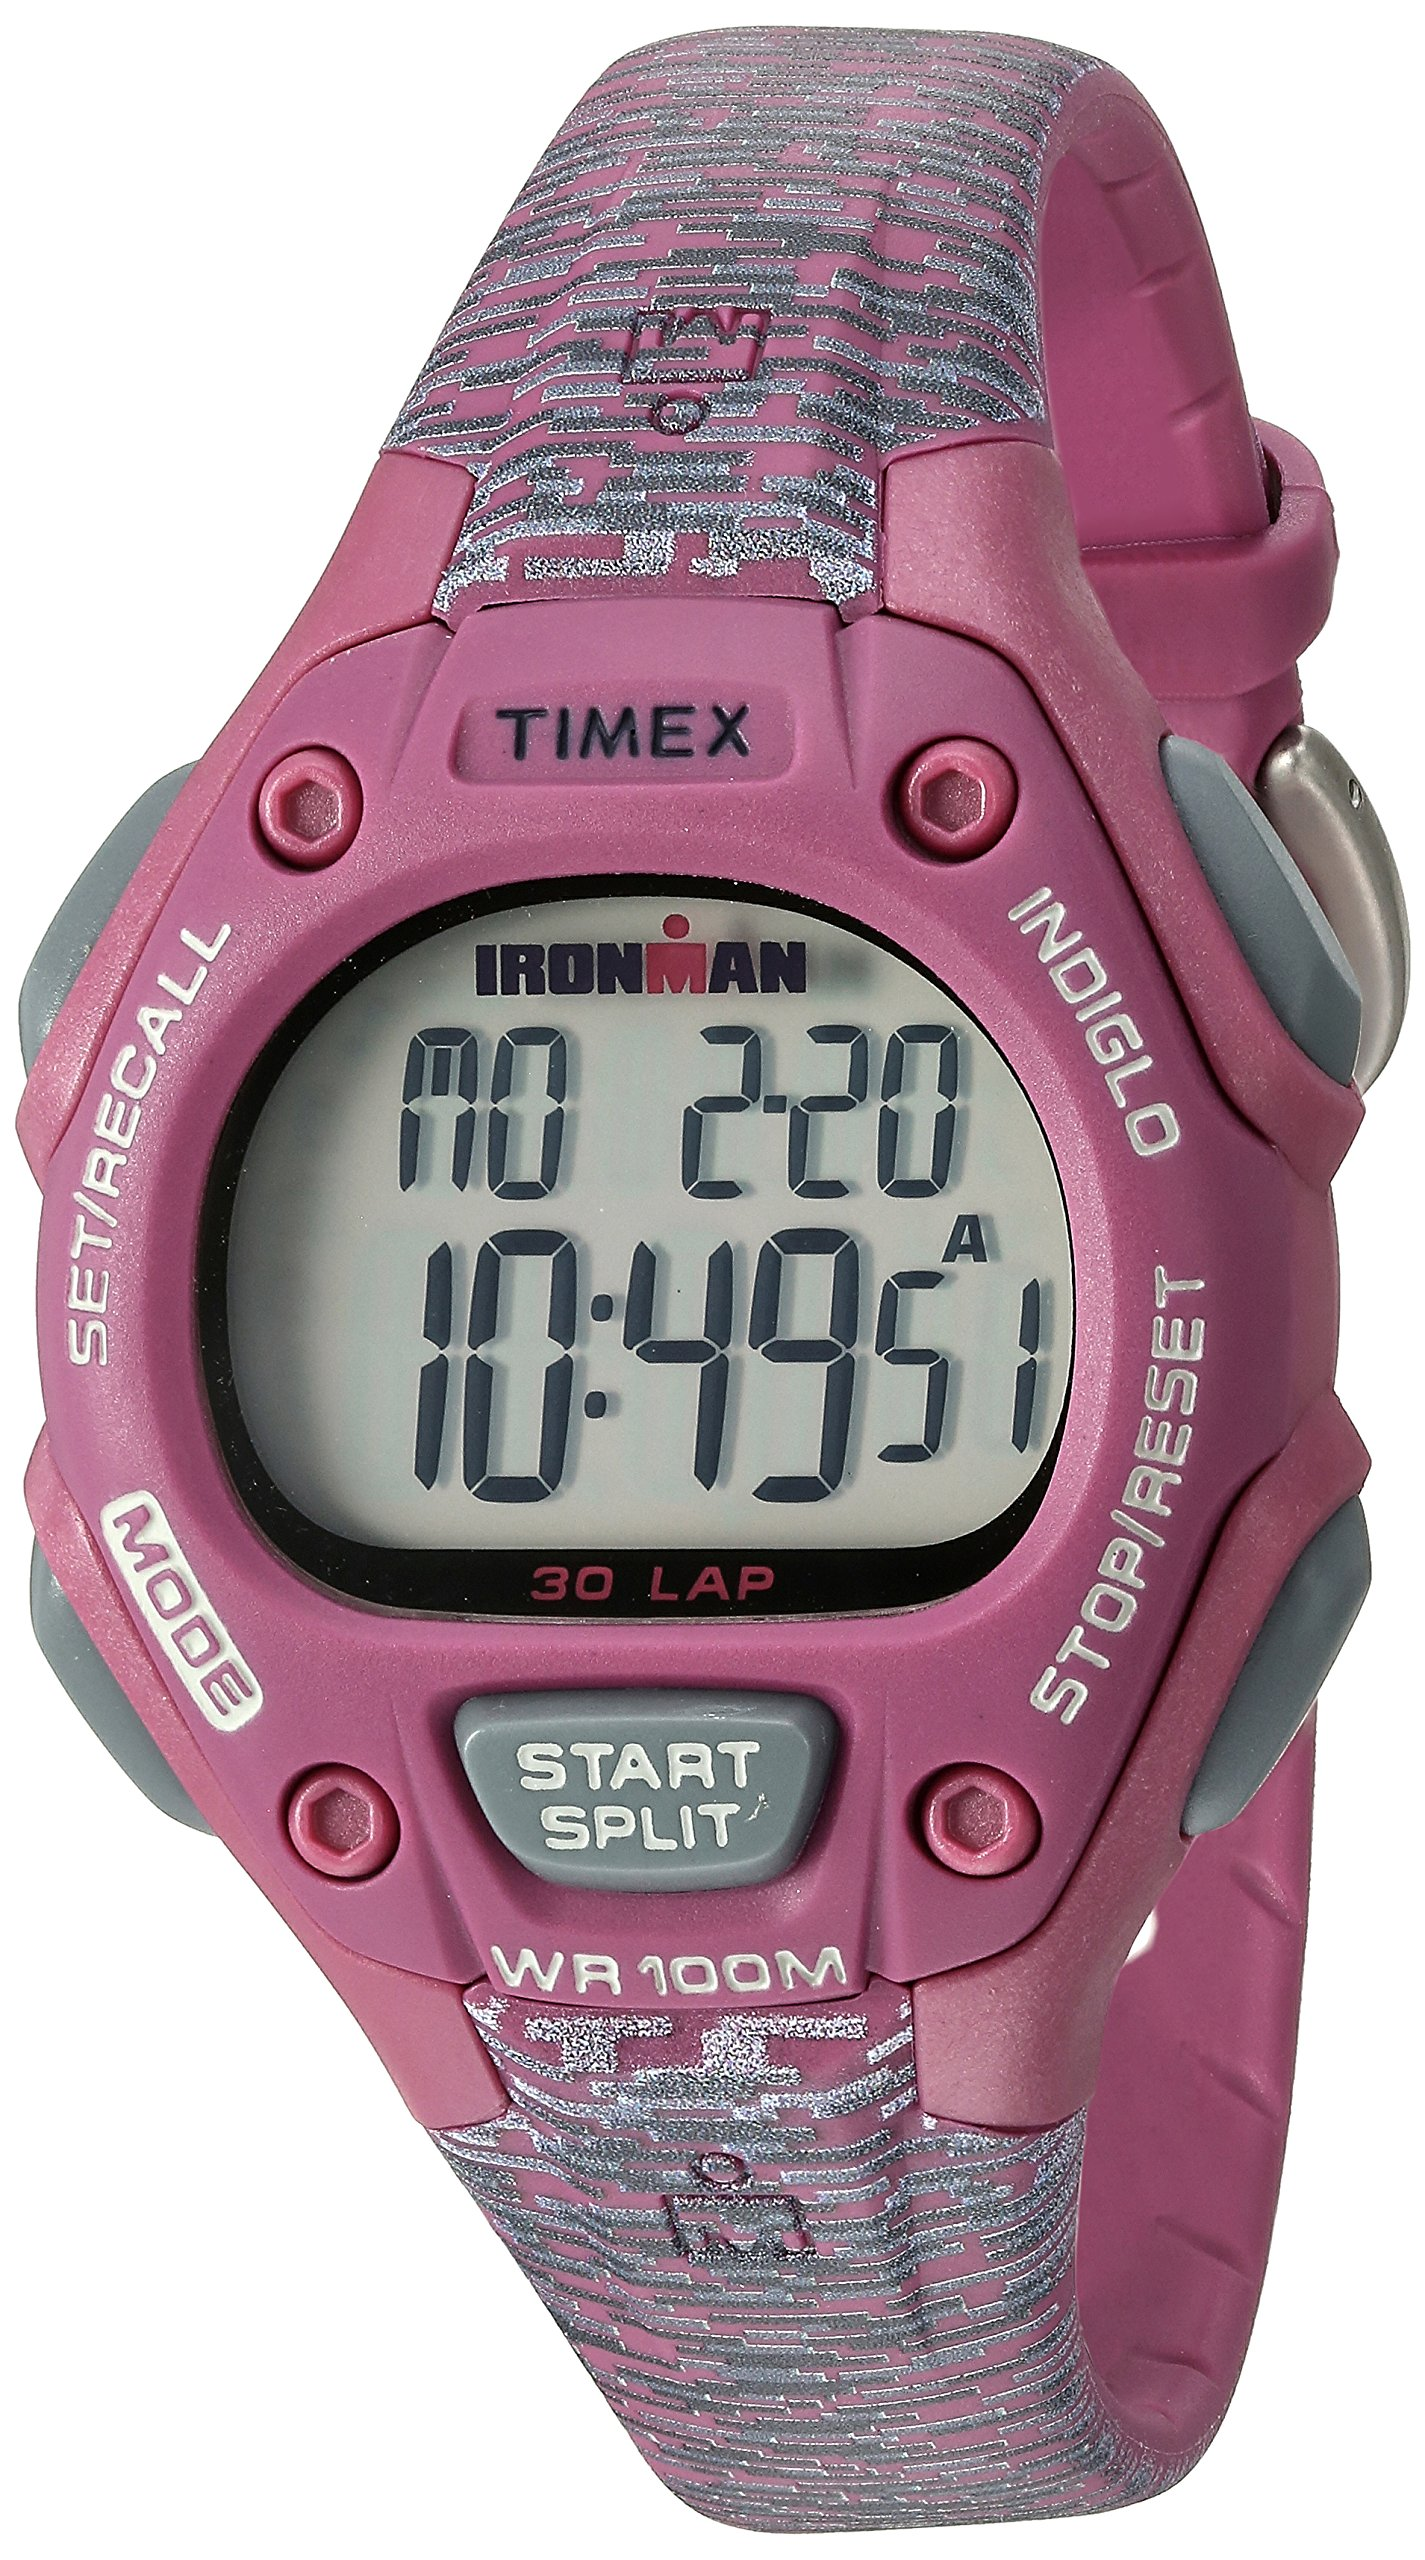 Timex Women's Ironman 30-Lap Digital Quartz Mid-Size Watch, Pink/Gray Texture - TW5M076009J by Timex